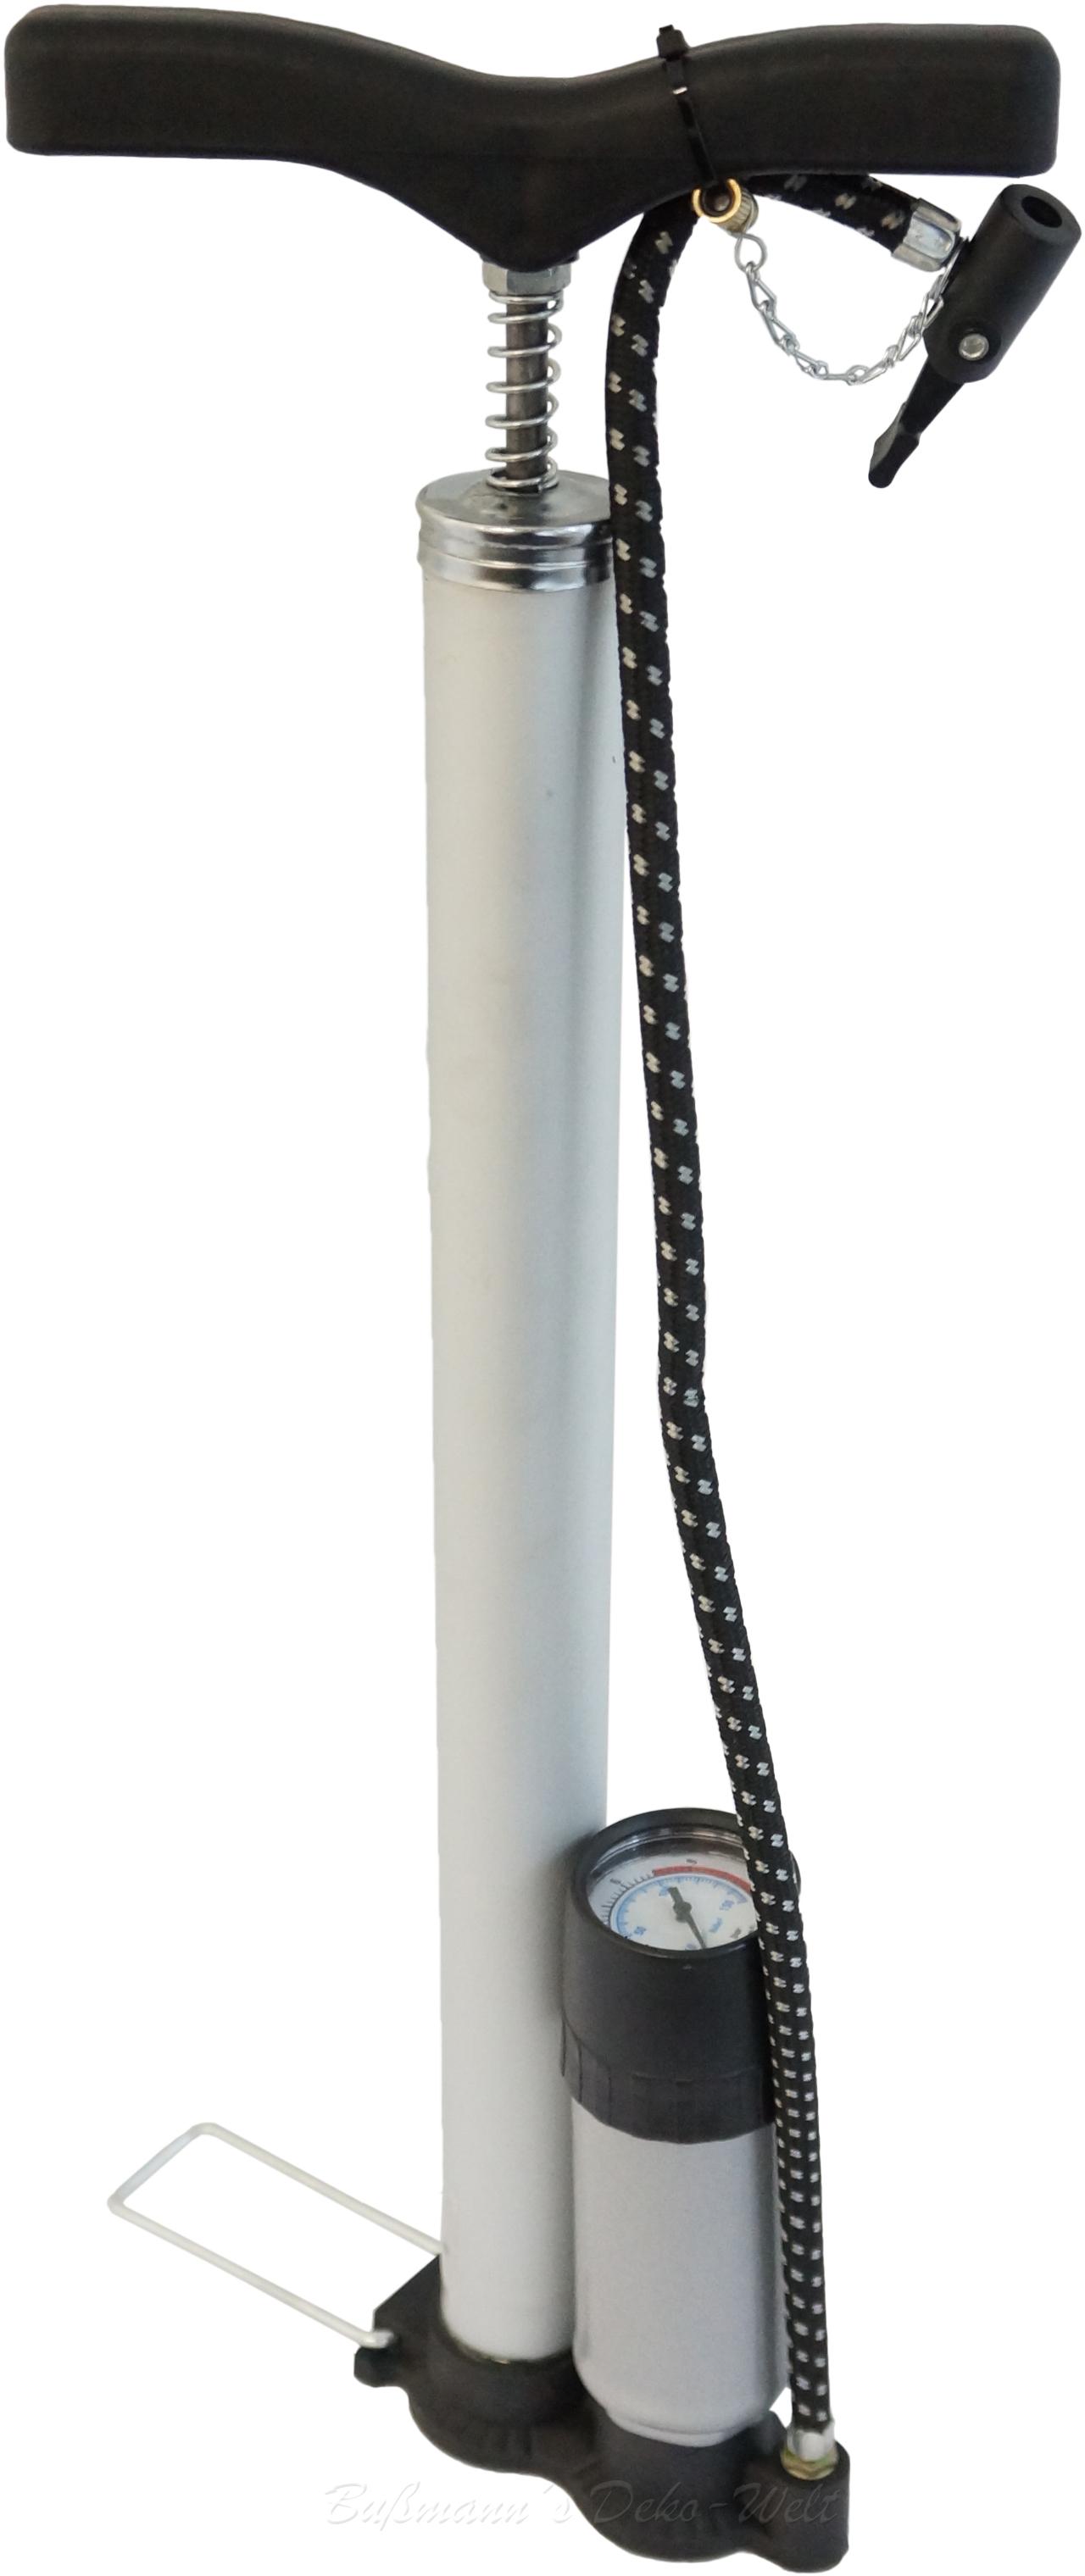 fahrradpumpe mit manometer alu fahrrad pumpe luftpumpe ebay. Black Bedroom Furniture Sets. Home Design Ideas